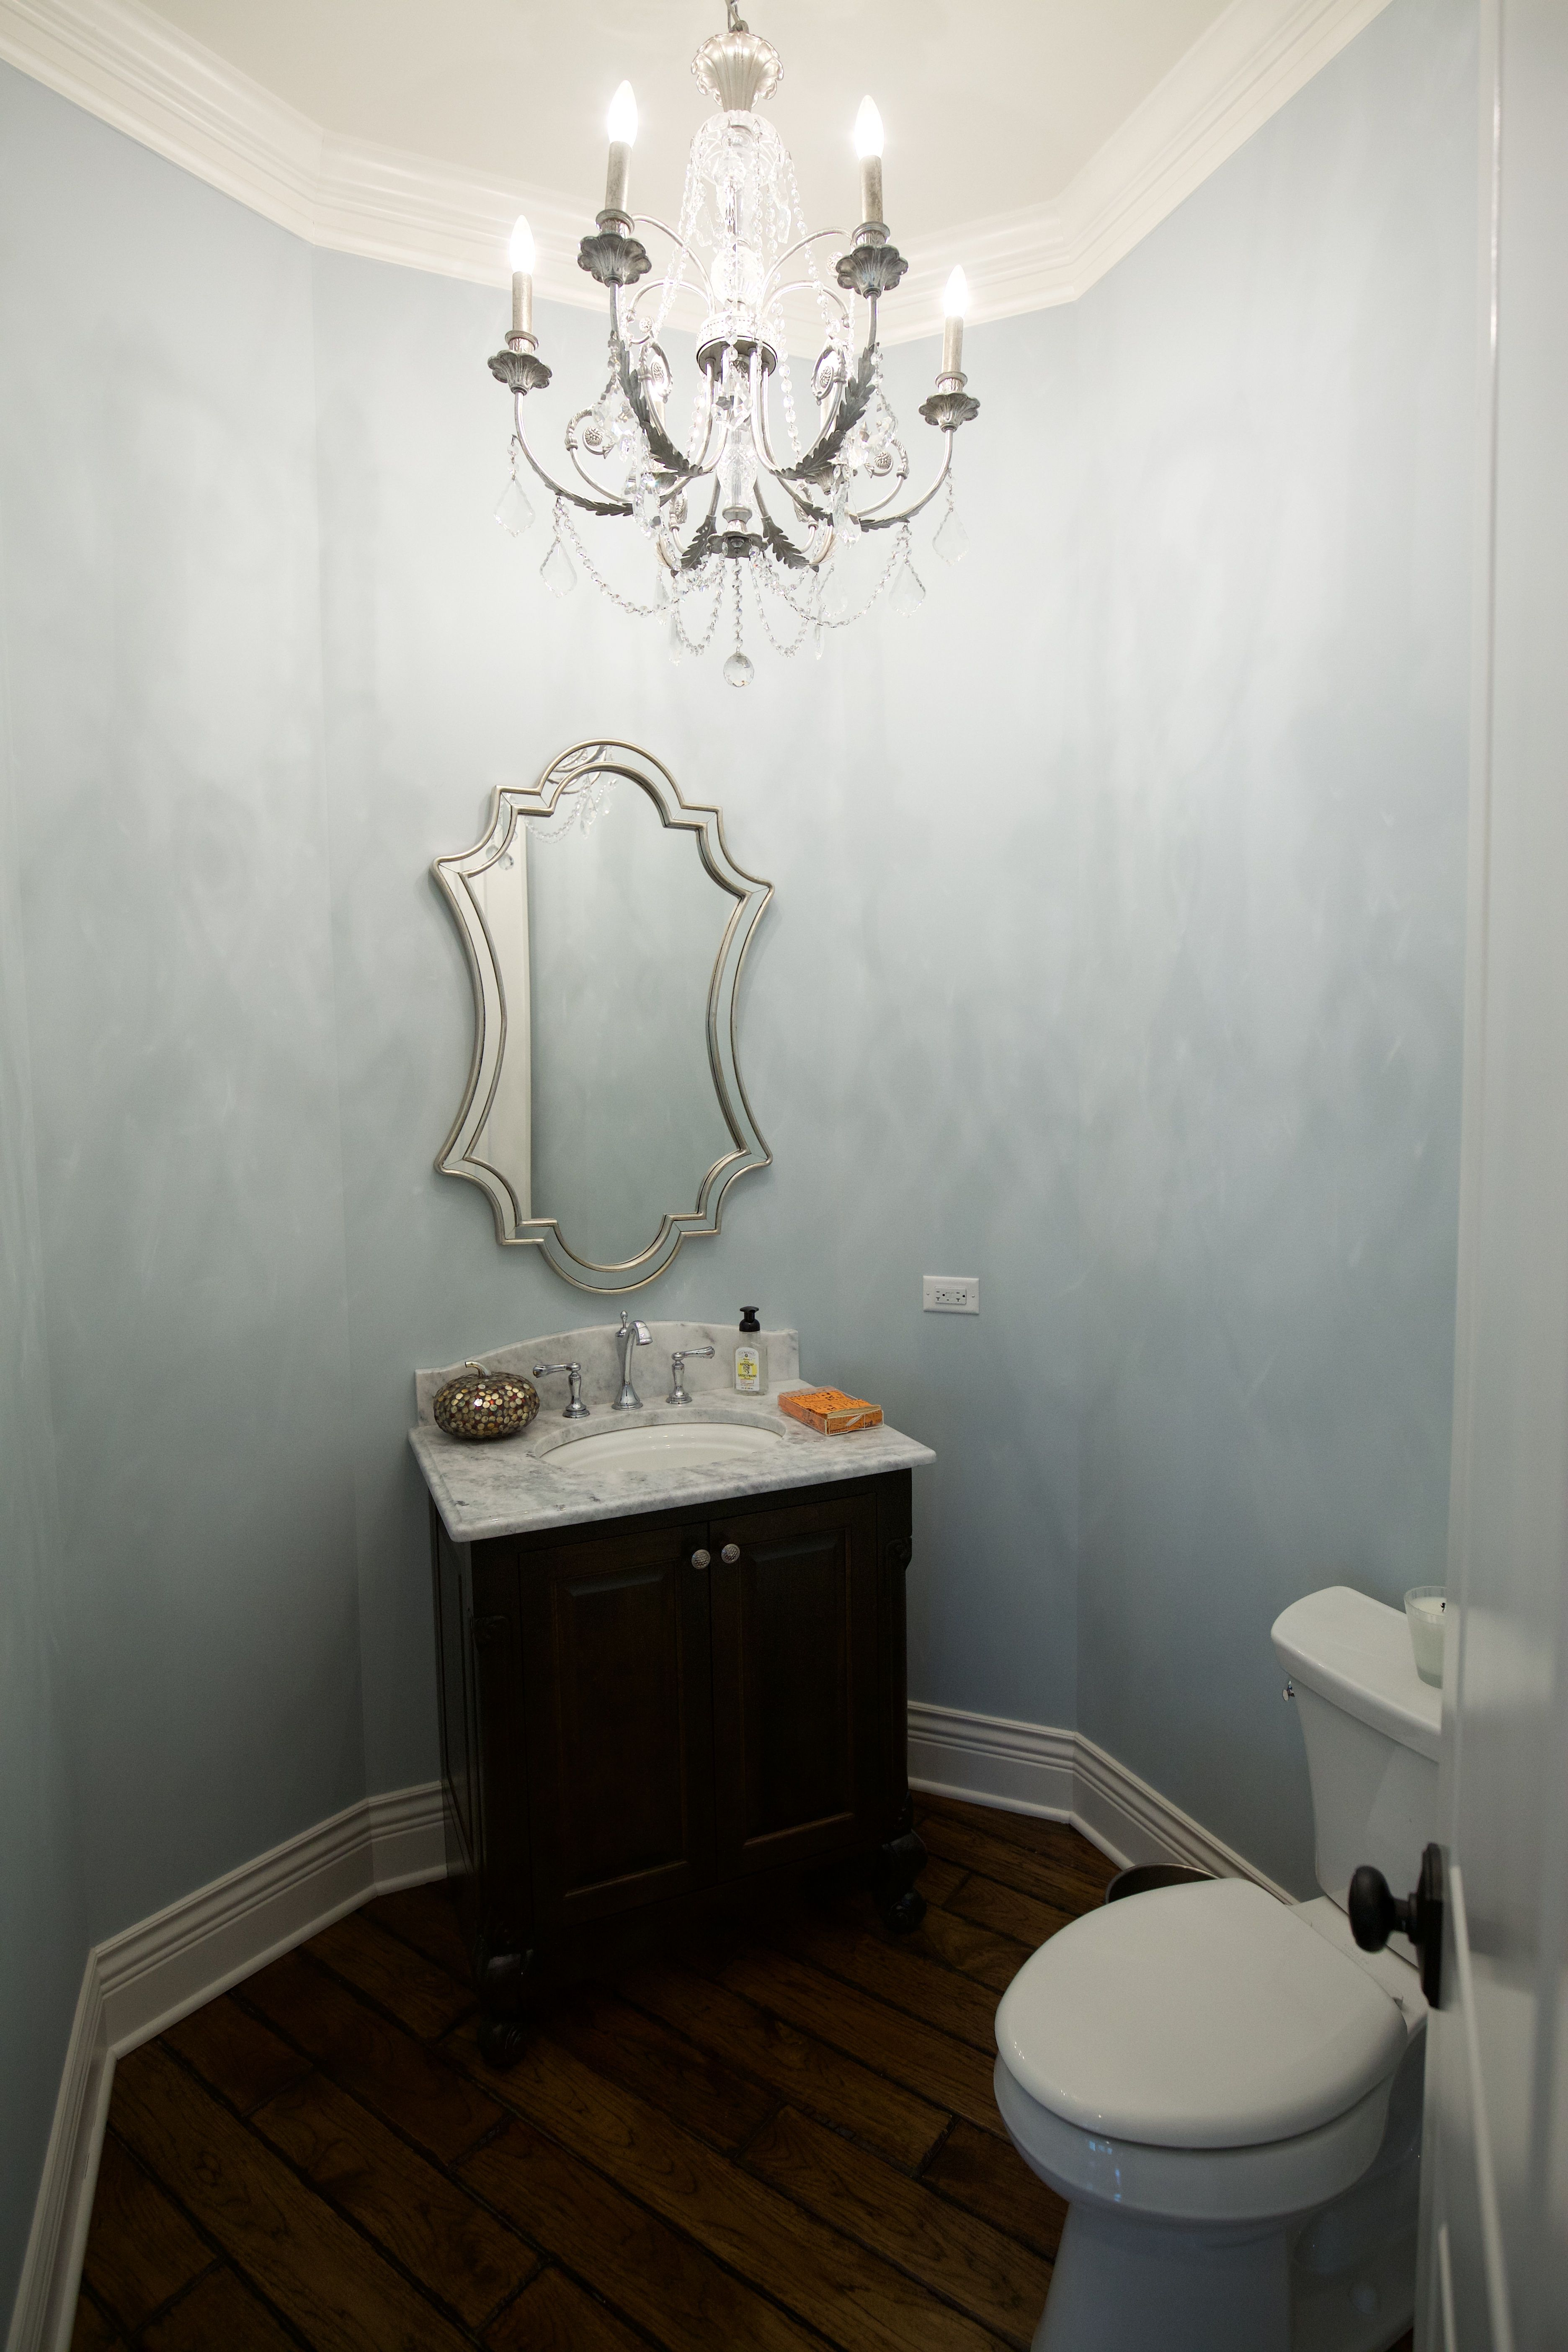 Powder Room   Architect: Meyer Design, Naperville, IL Builder: Lakewest Custom Homes, Naperville, IL